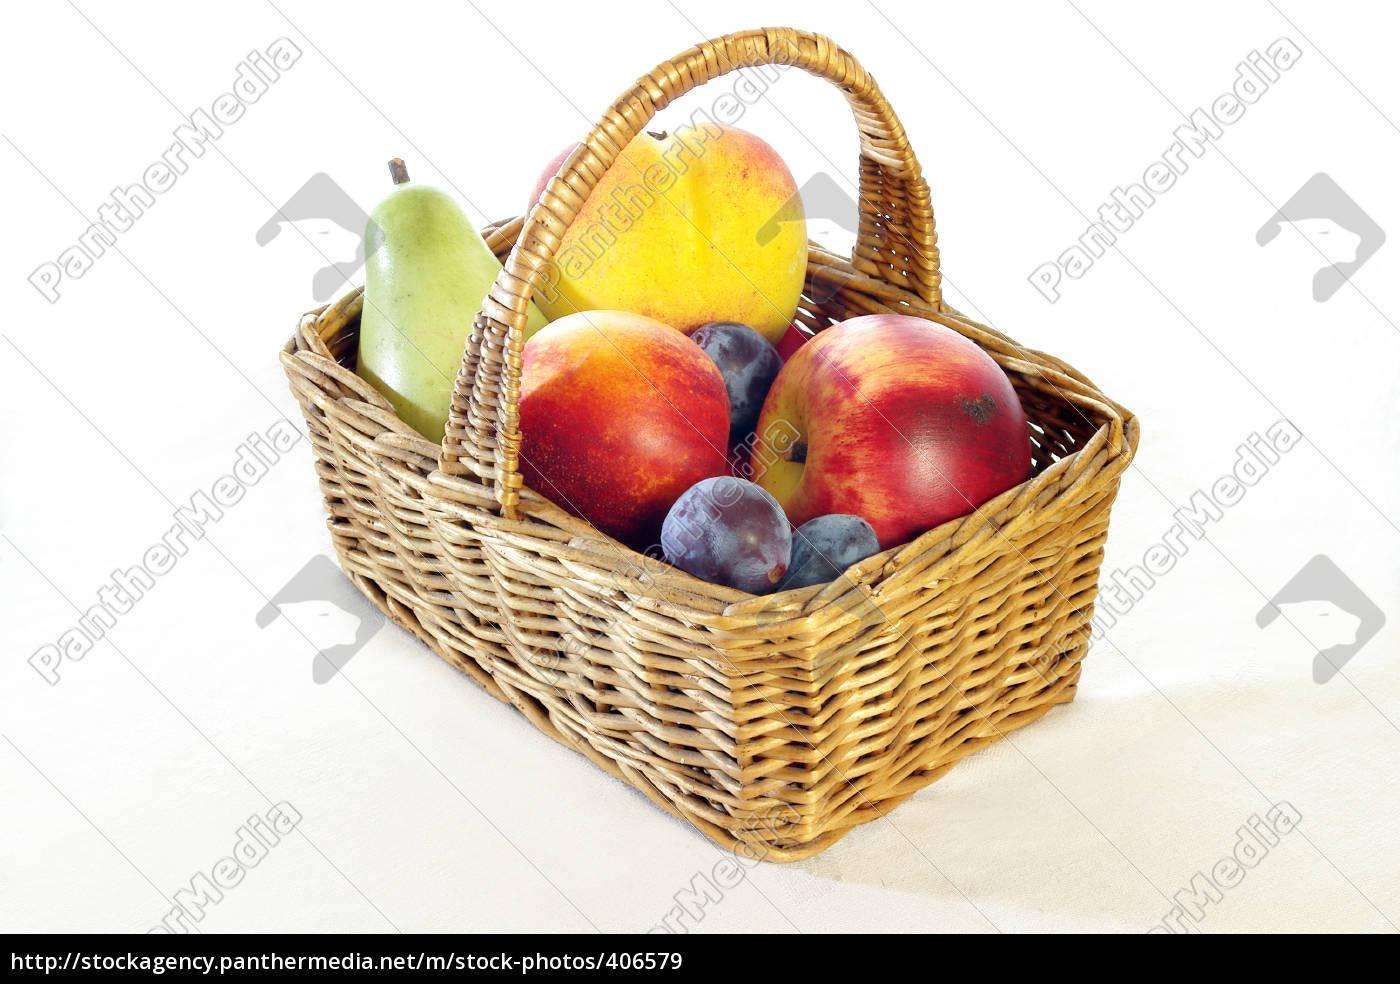 fruit, basket - 406579